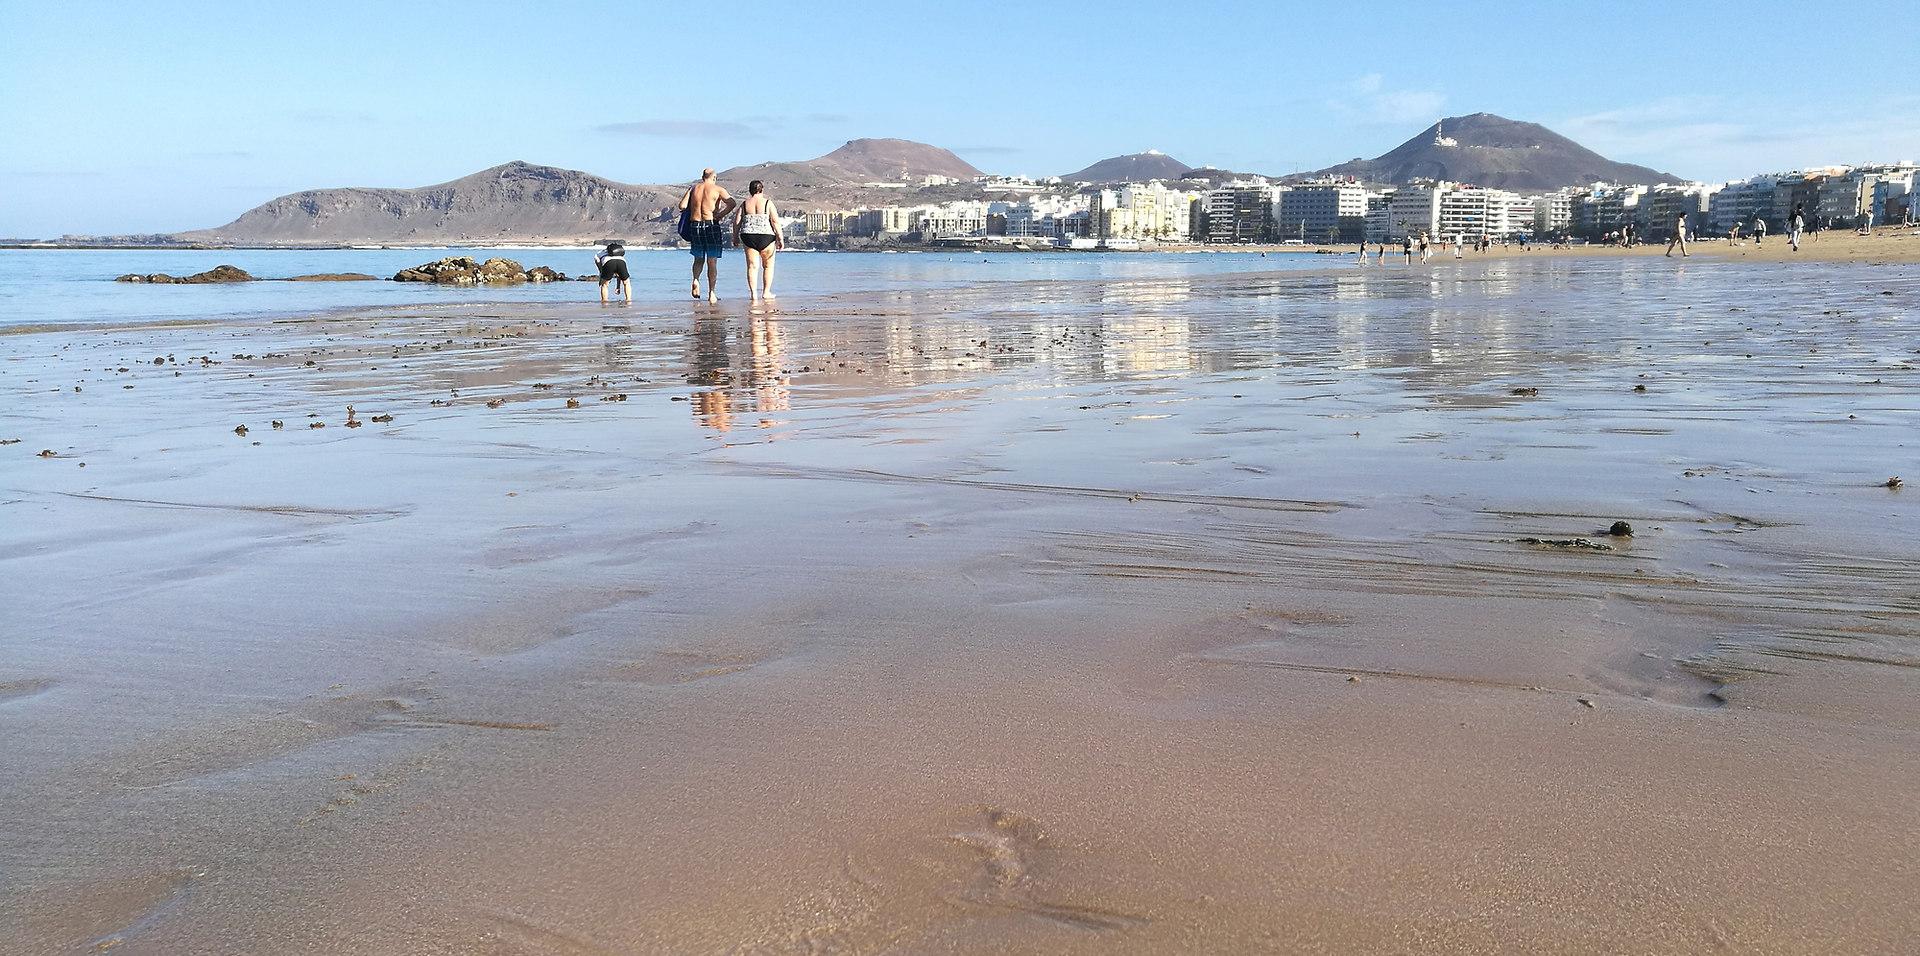 Las Palmas of Gran Canaria beach